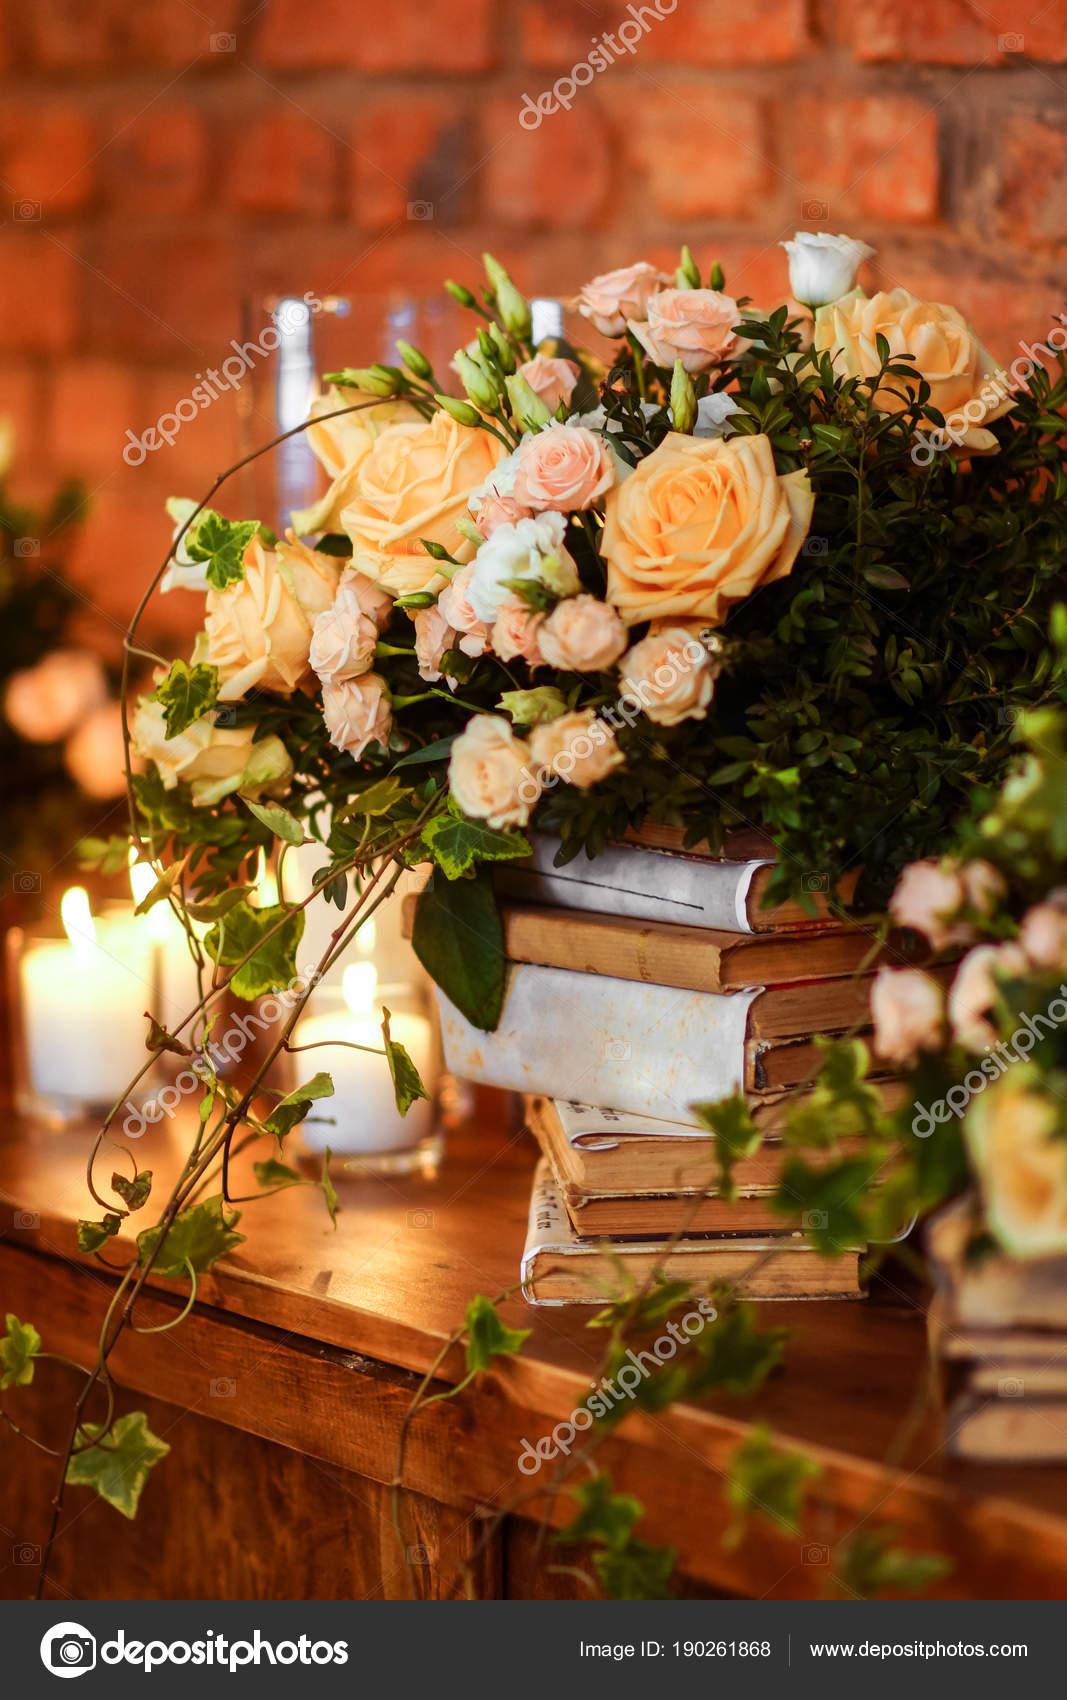 96b64cda7fe Γαμήλια διακόσμηση λουλουδιών σύνθεση, εσωτερικό. Εορταστική ...